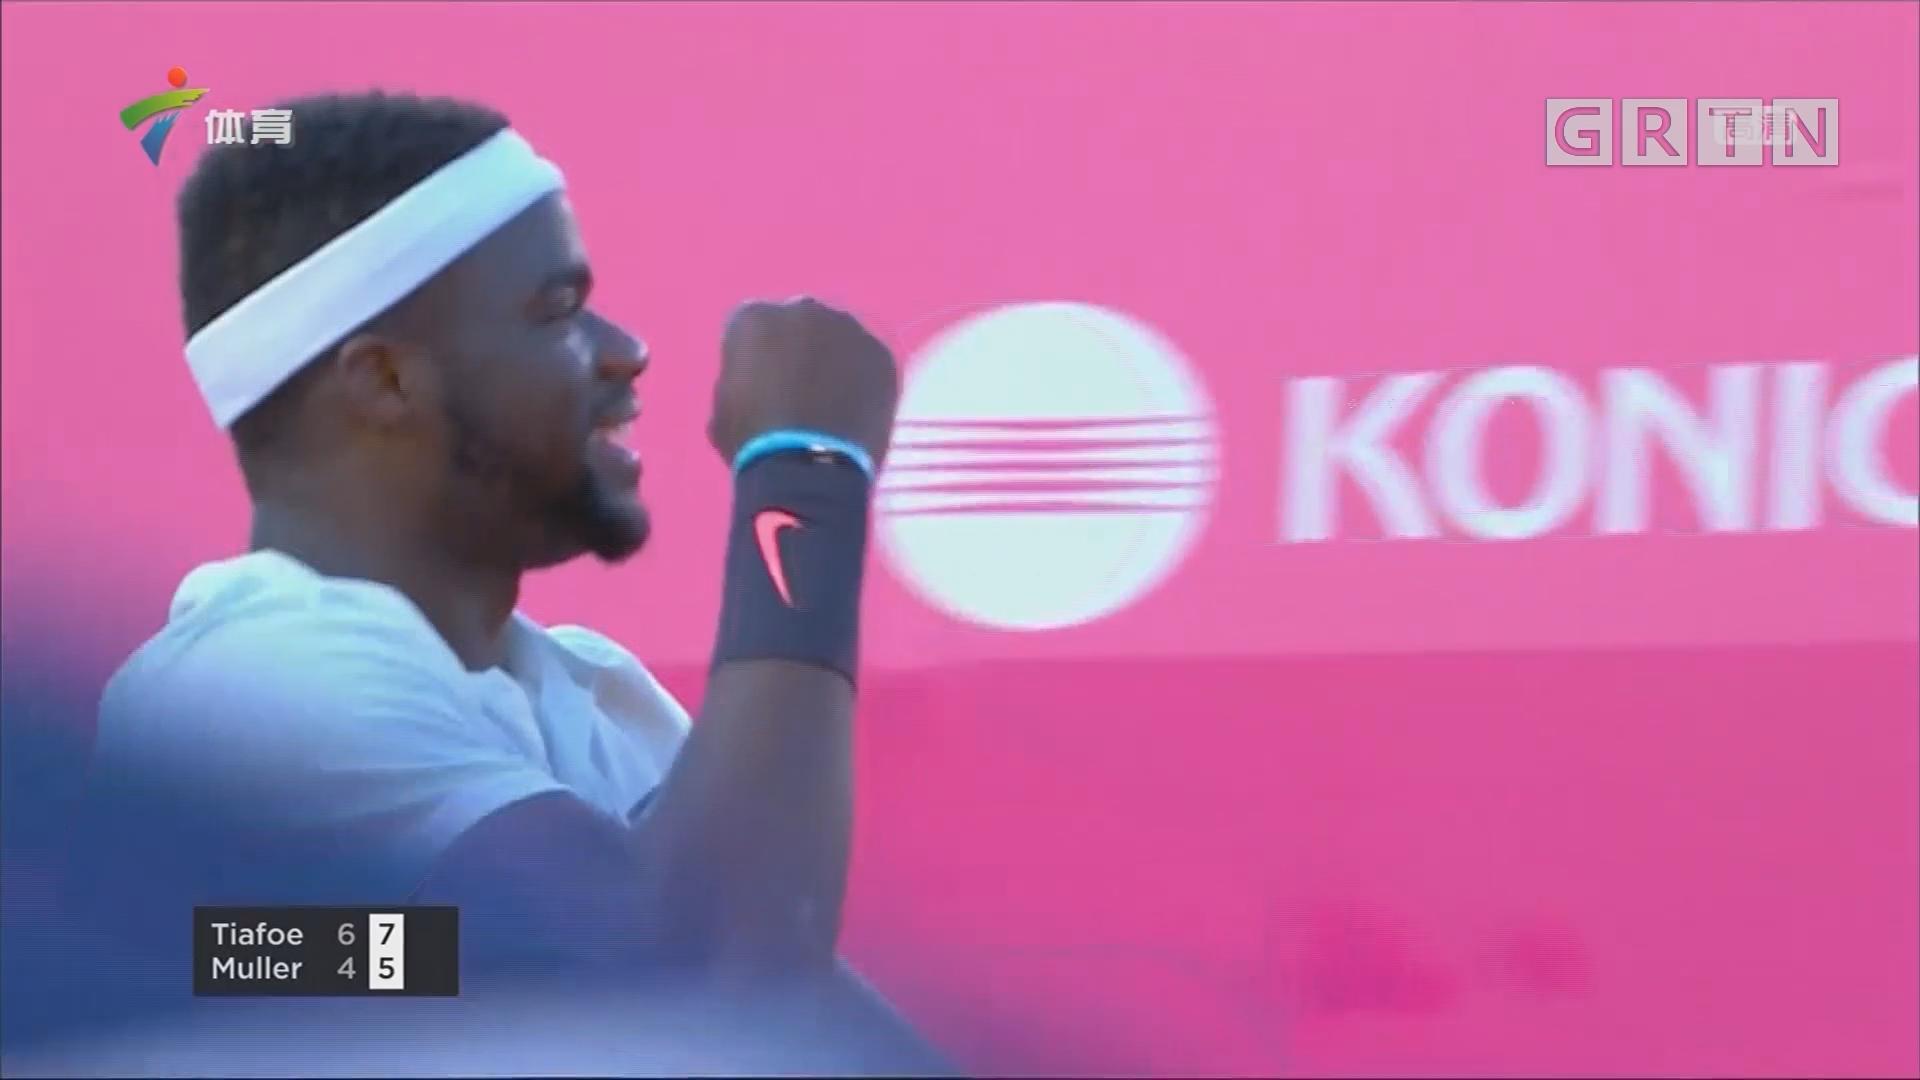 ATP埃斯托里尔公开赛 小将蒂奥菲爆冷晋级